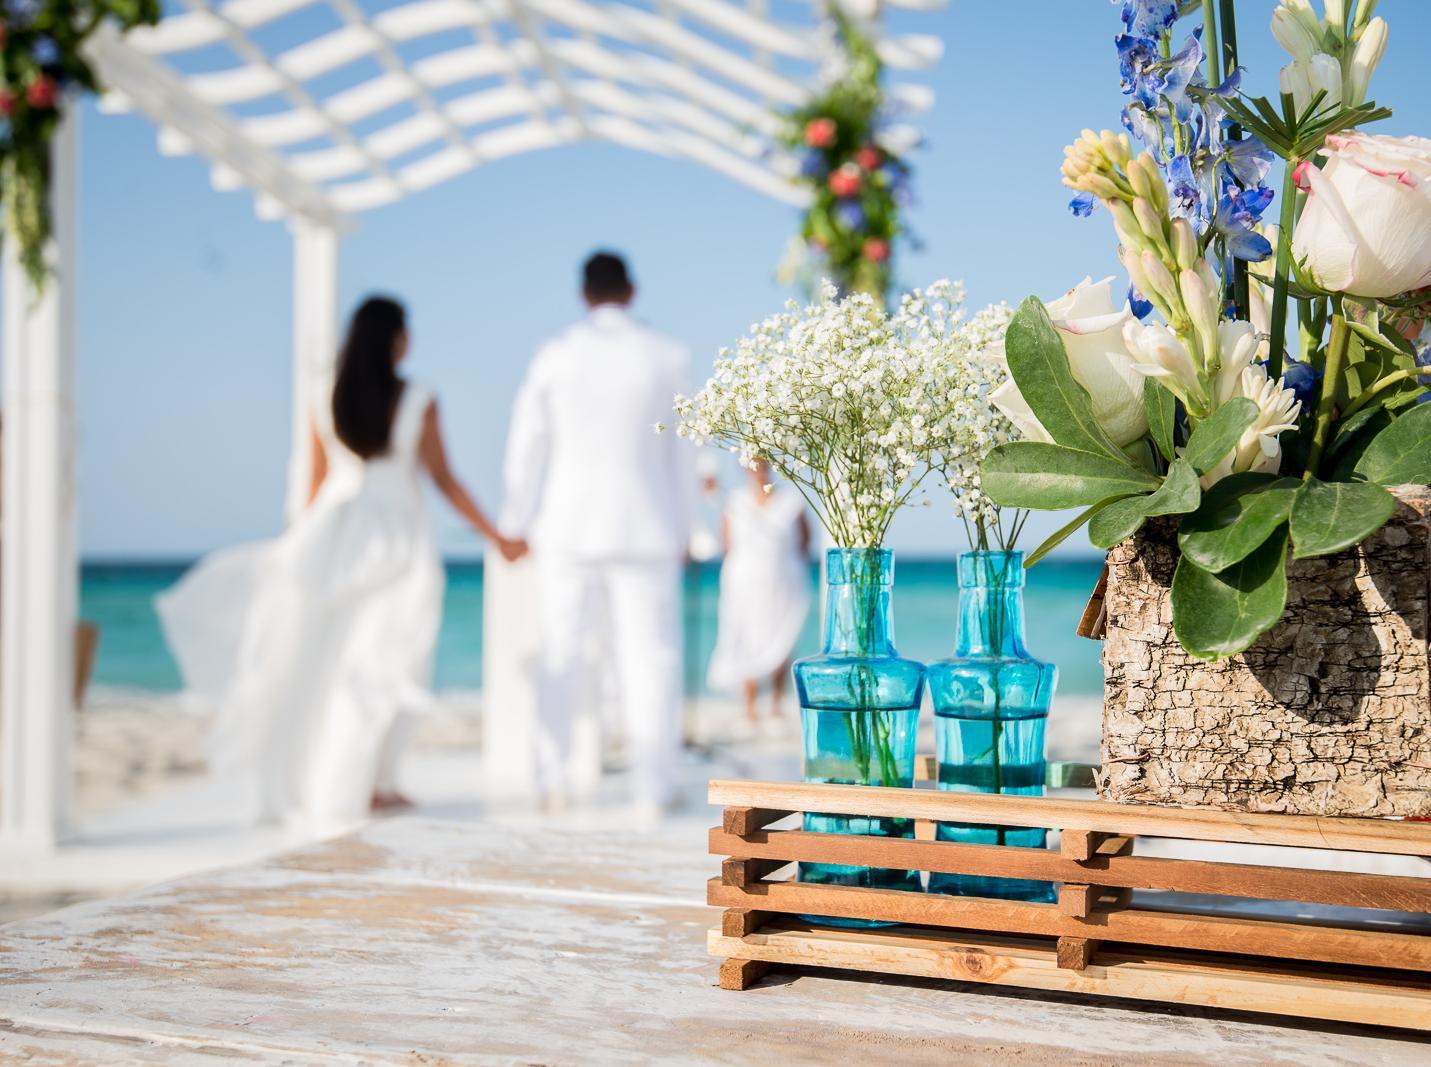 bodas-rustico-playa-cuba-6431.jpg